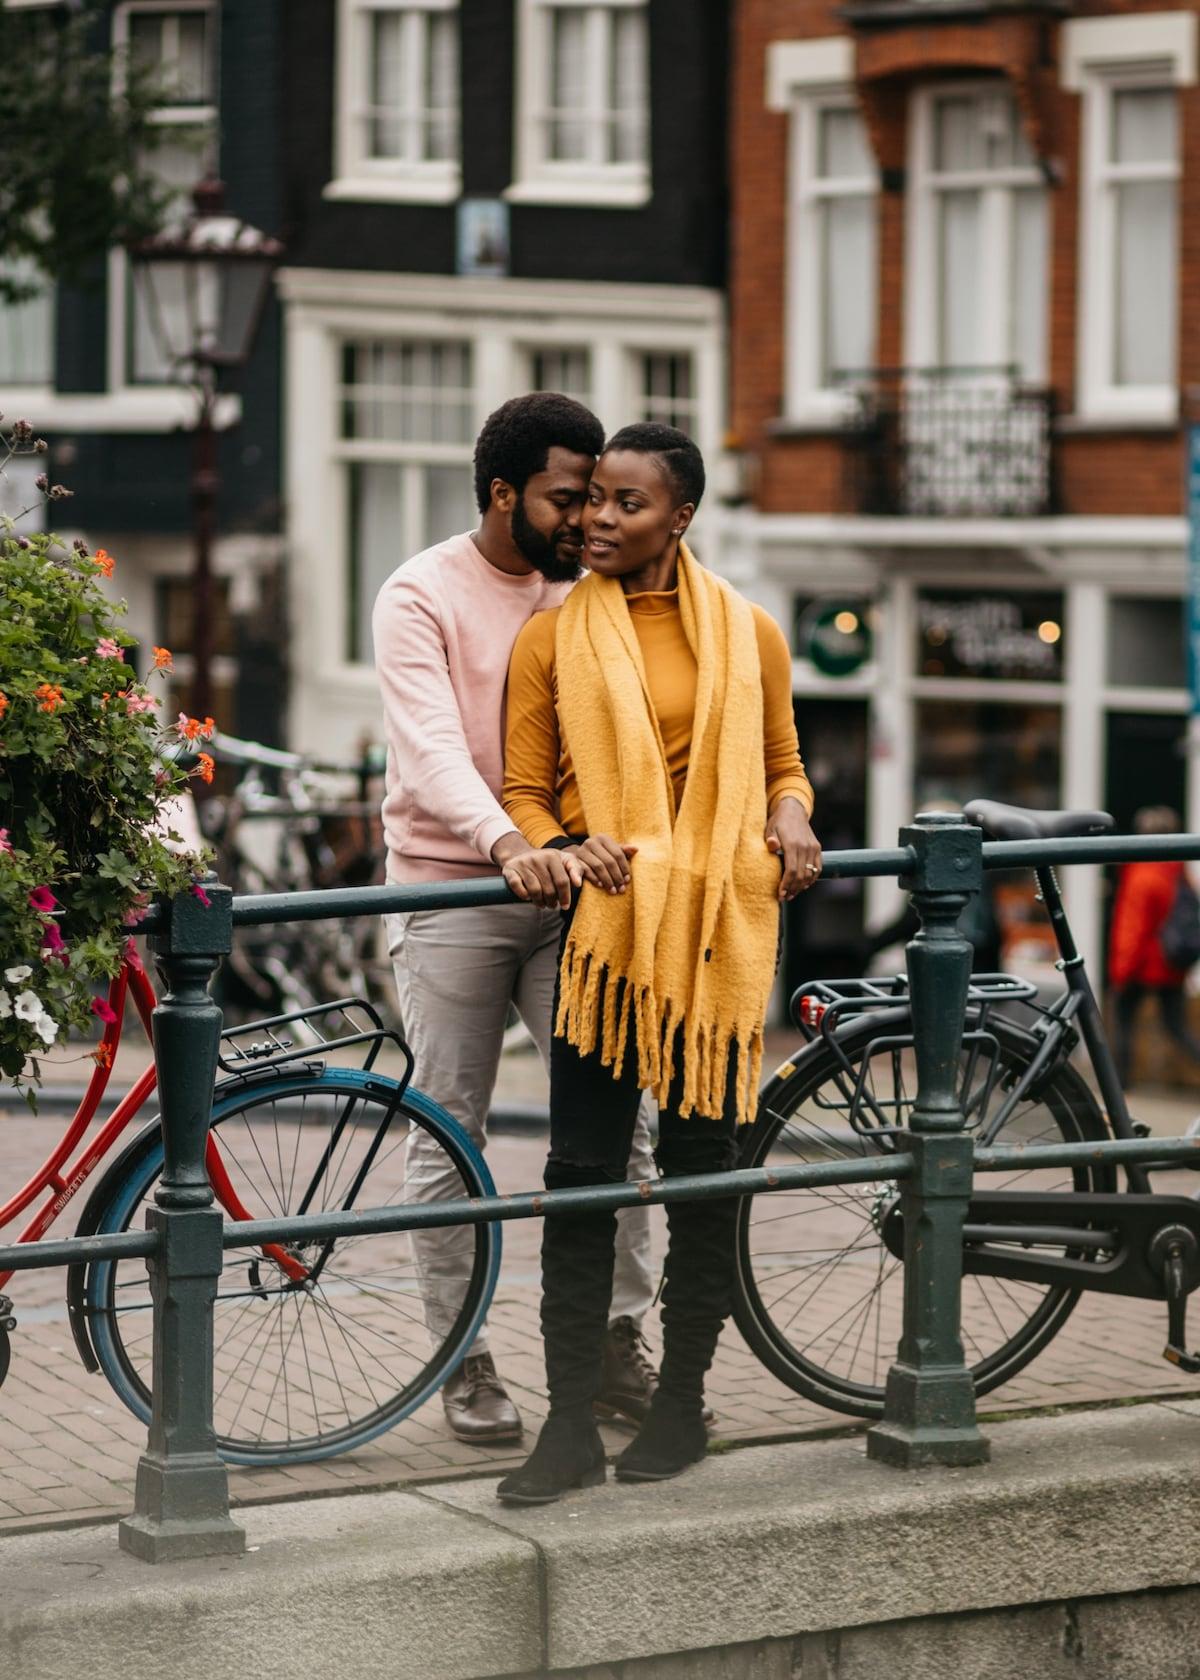 Me dating Amsterdam